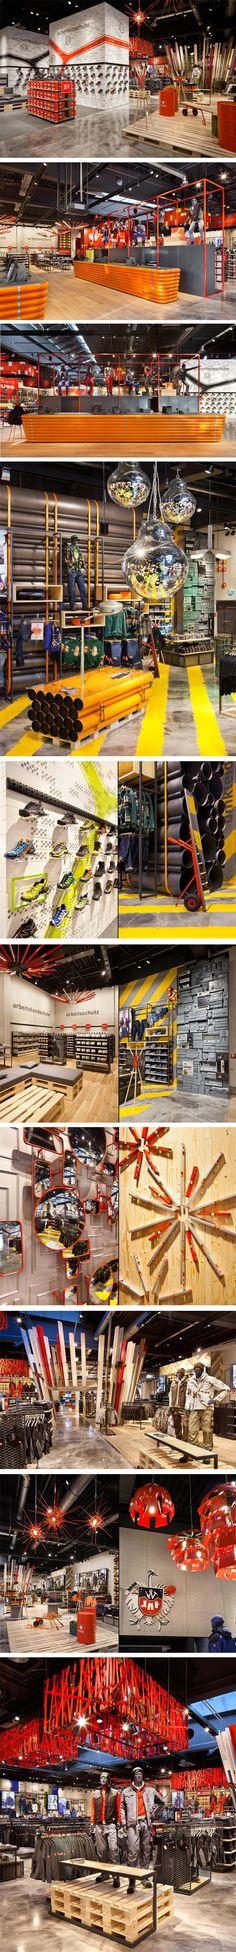 ENGELBERT STRAUSS workwear store by Plajer & Franz, Bergkirchen – Germany.